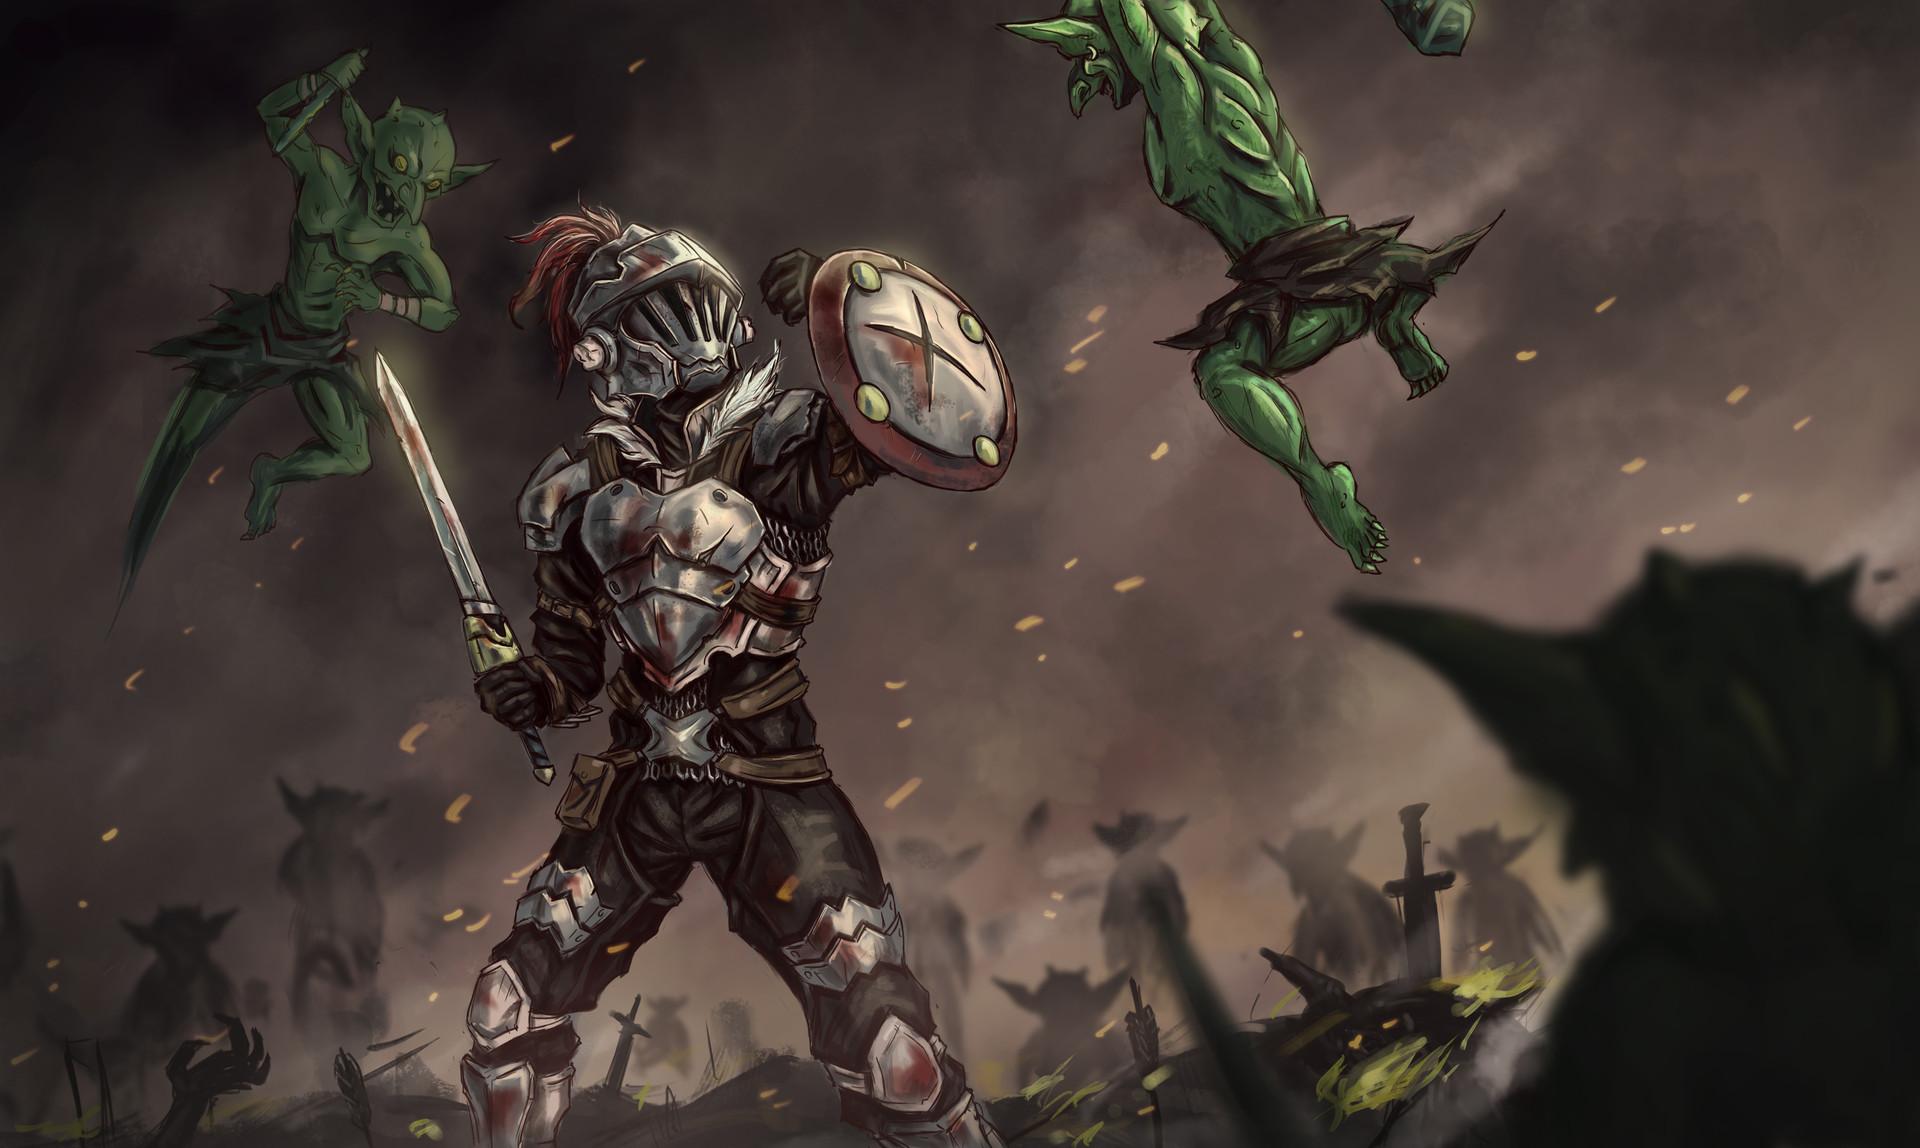 Goblin Slayer HD Wallpaper | Background Image | 1920x1148 ...